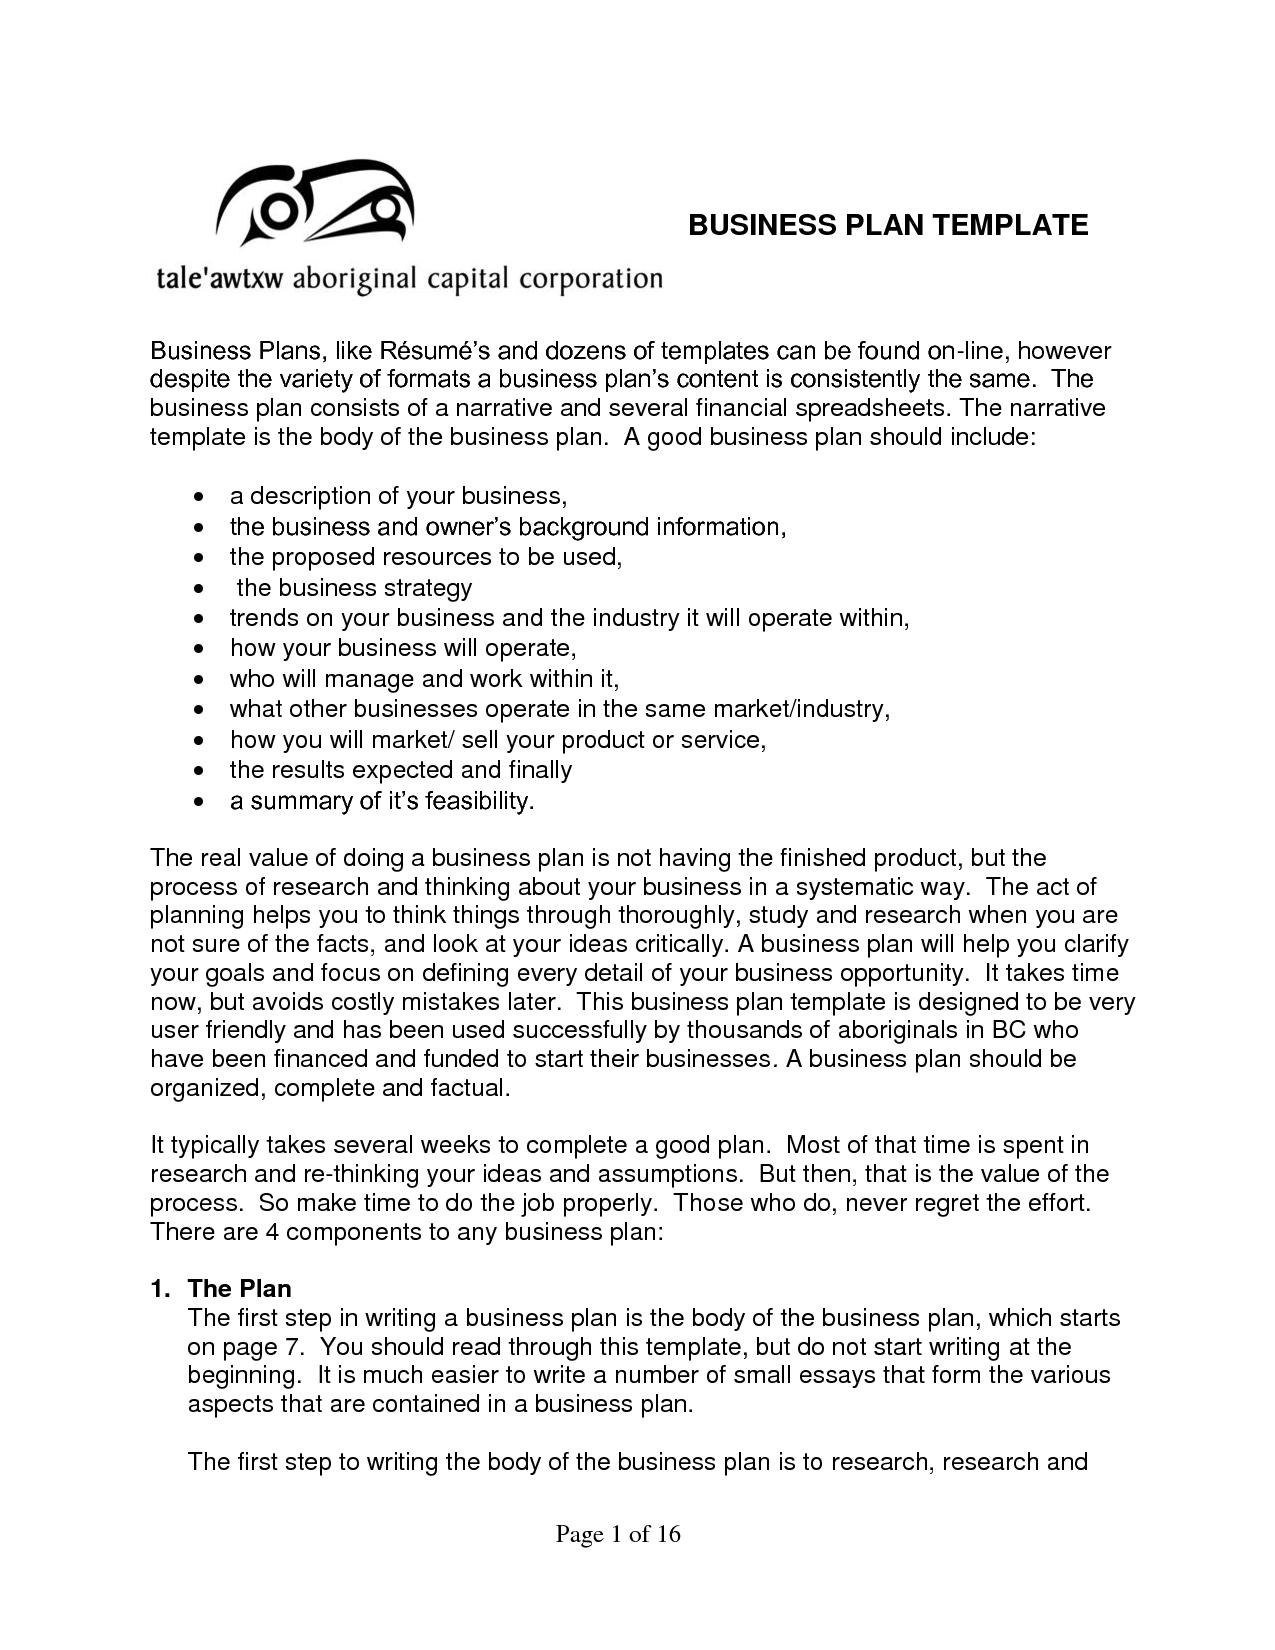 Writing A Small Business Plan Template | Komunstudio